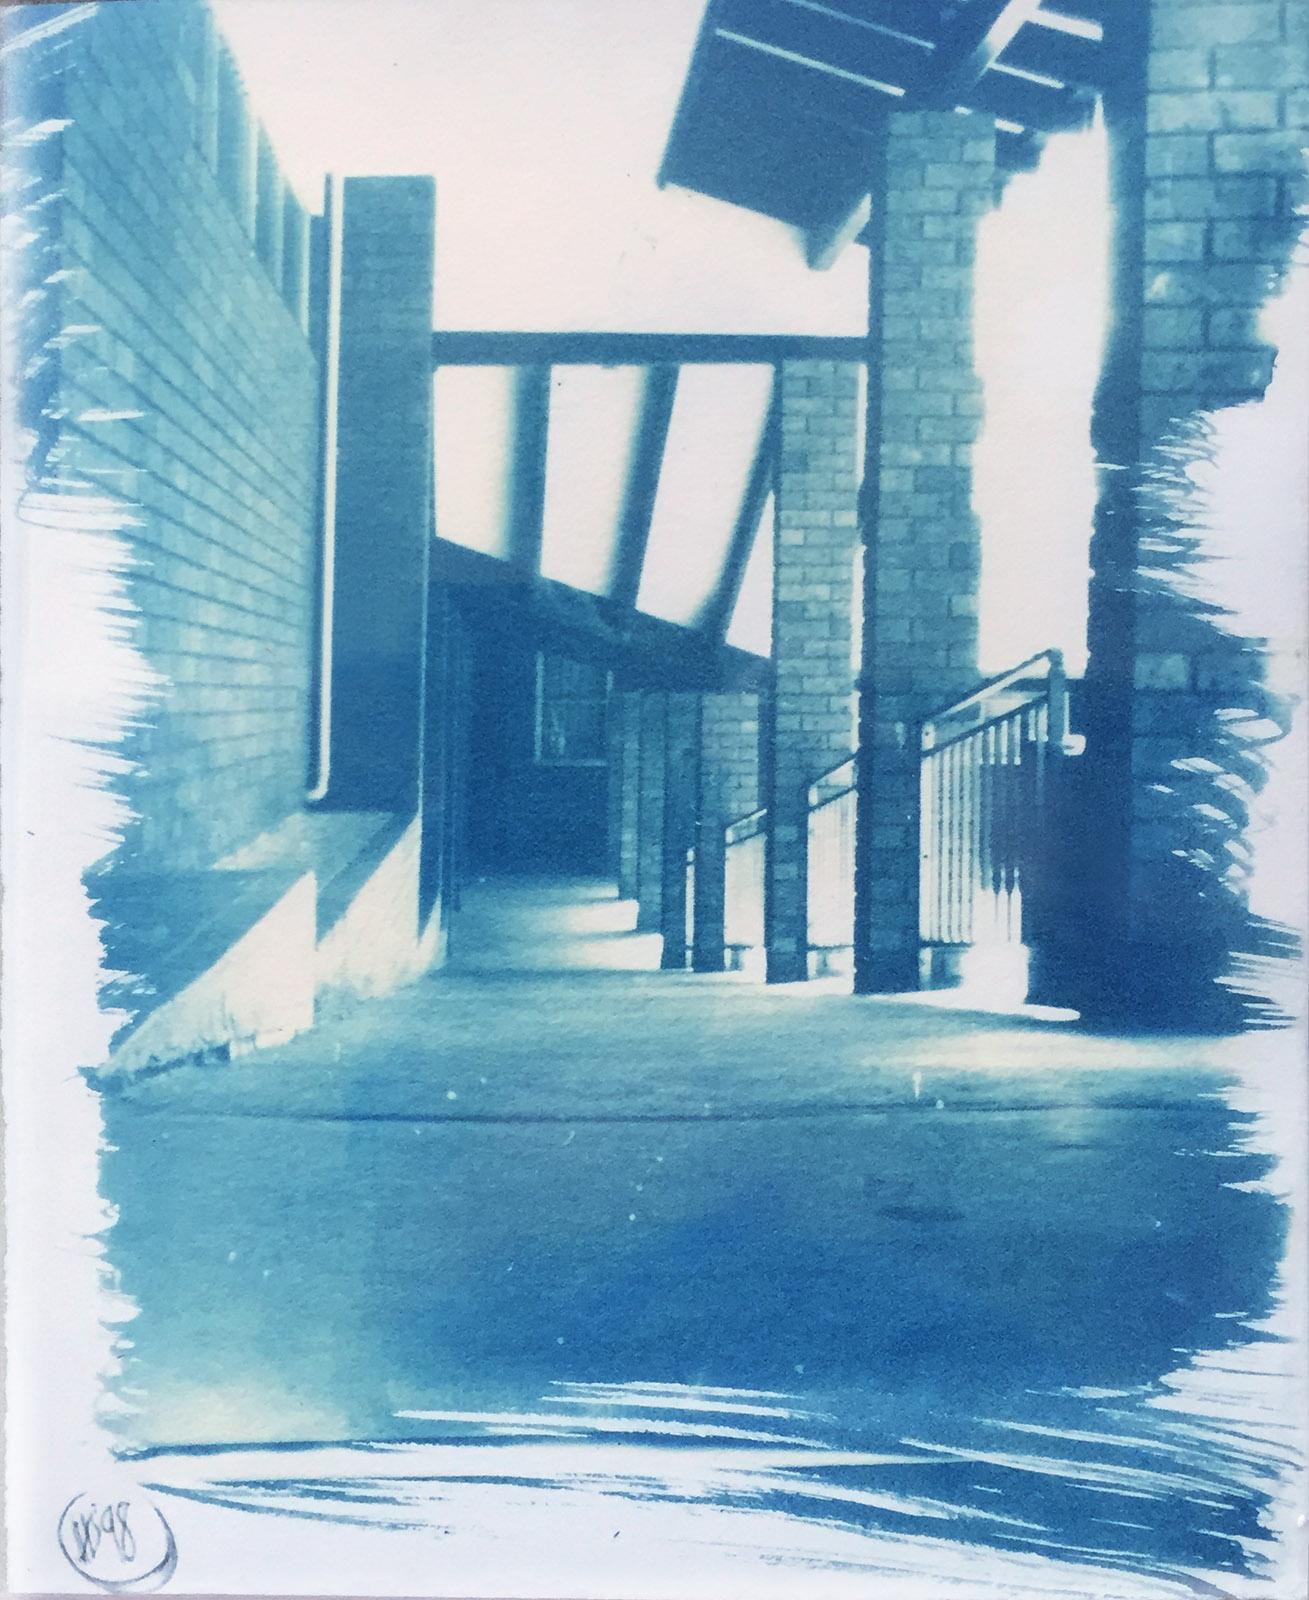 pinhole cyanotype 8x10